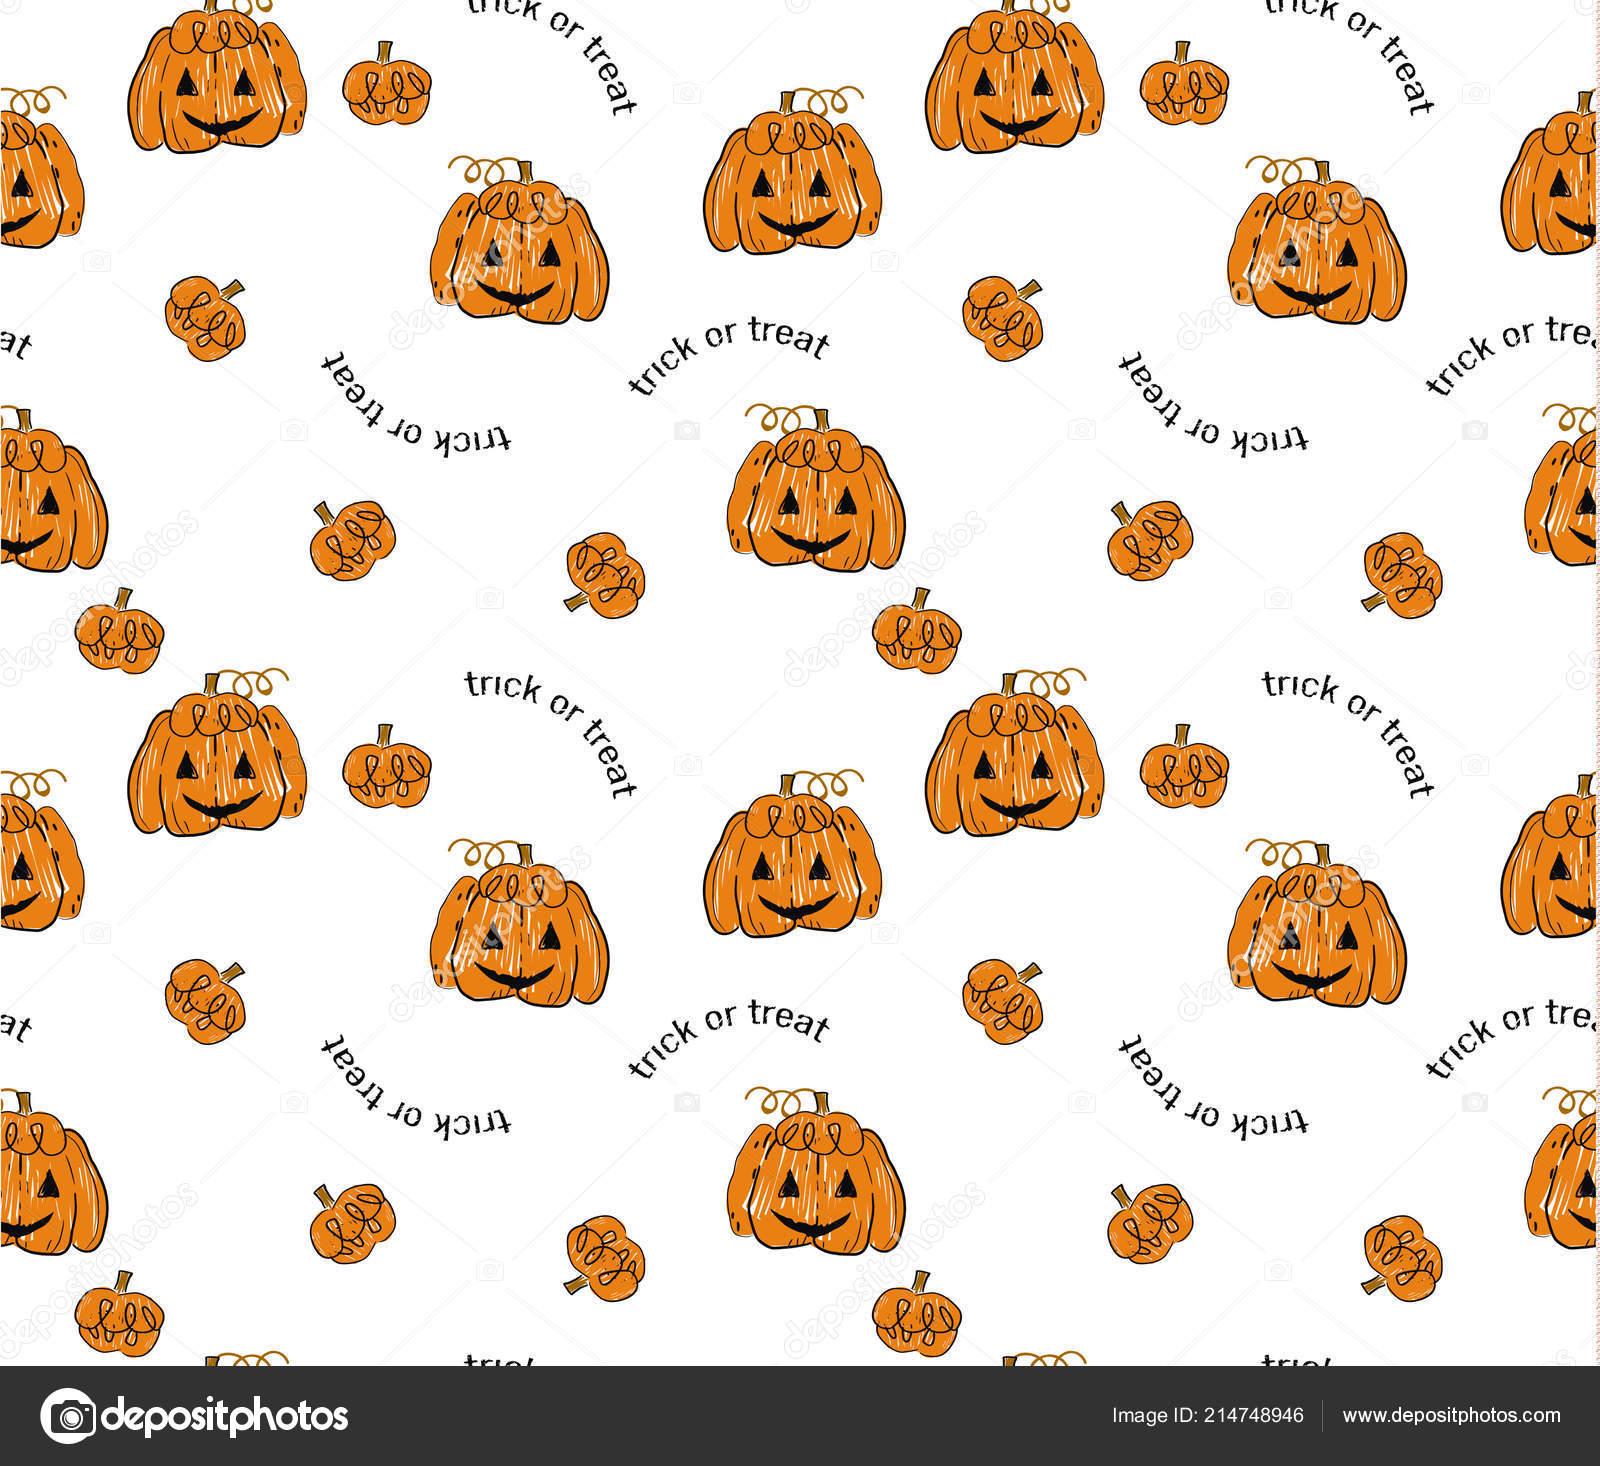 Cute Halloween Pumpkin Pattern On White Background Stock Vector C Galieva0410 214748946